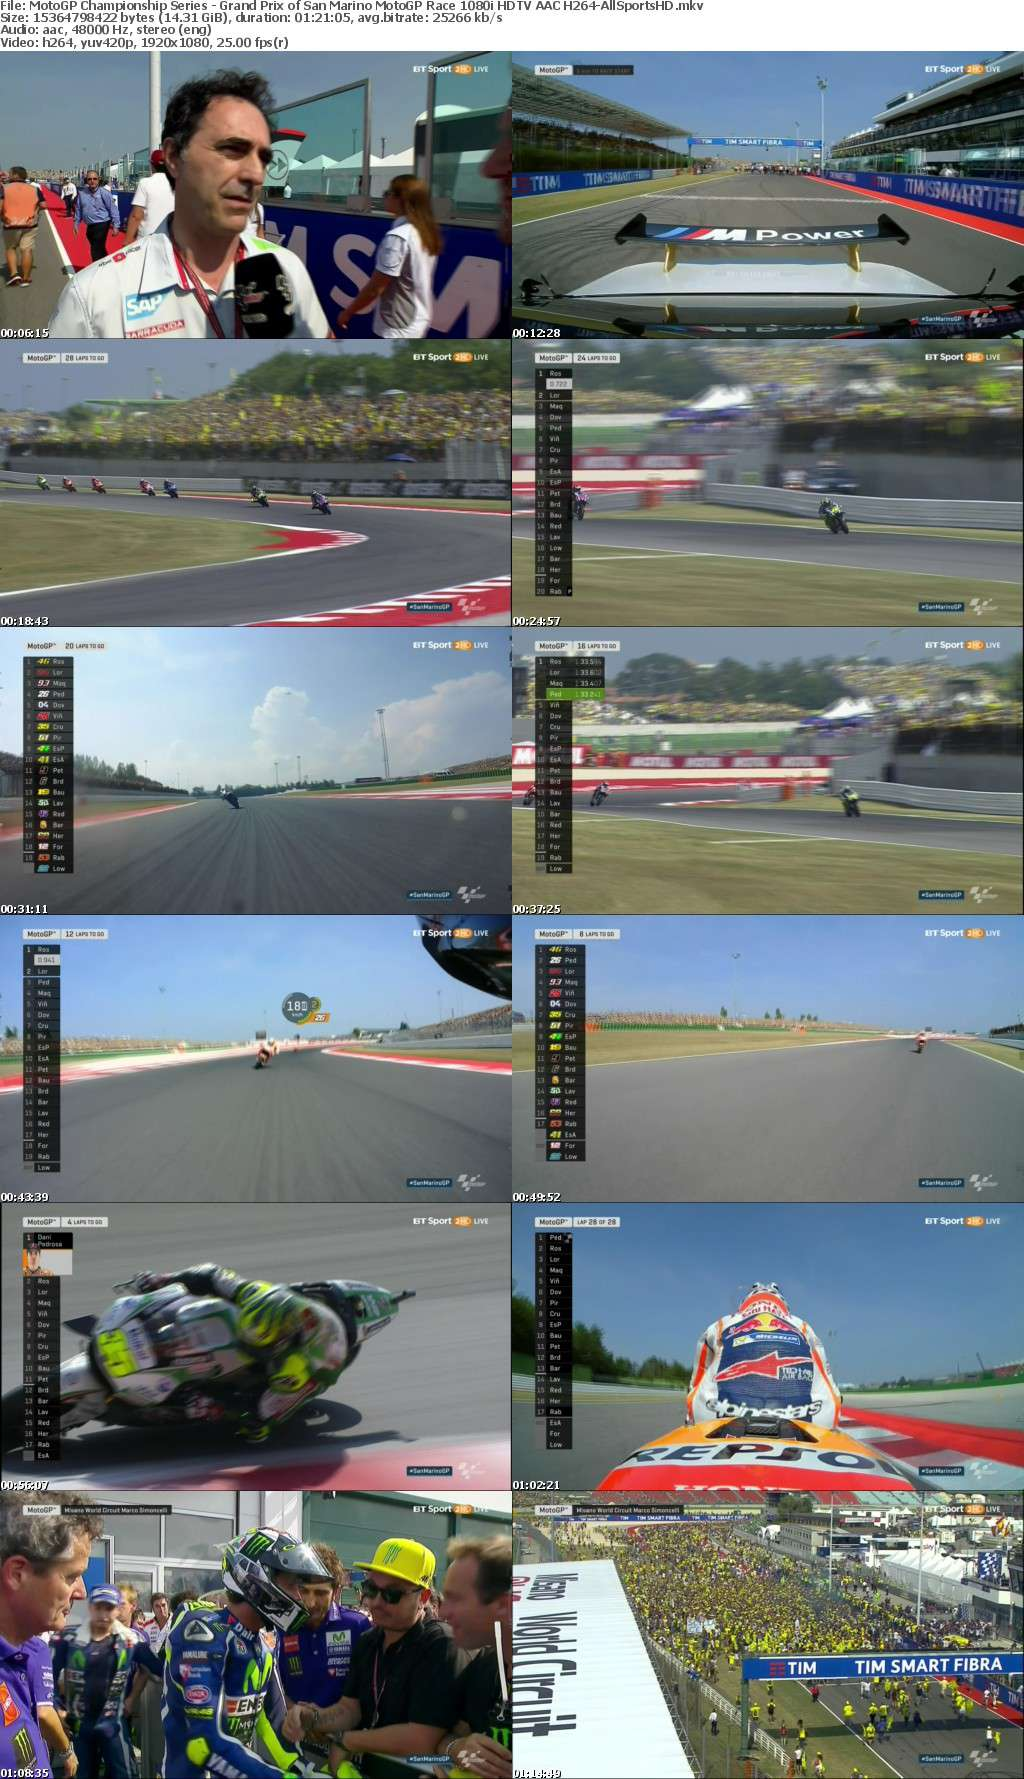 MotoGP Championship Series - Grand Prix of San Marino MotoGP Race 1080i HDTV AAC H264-AllSportsHD